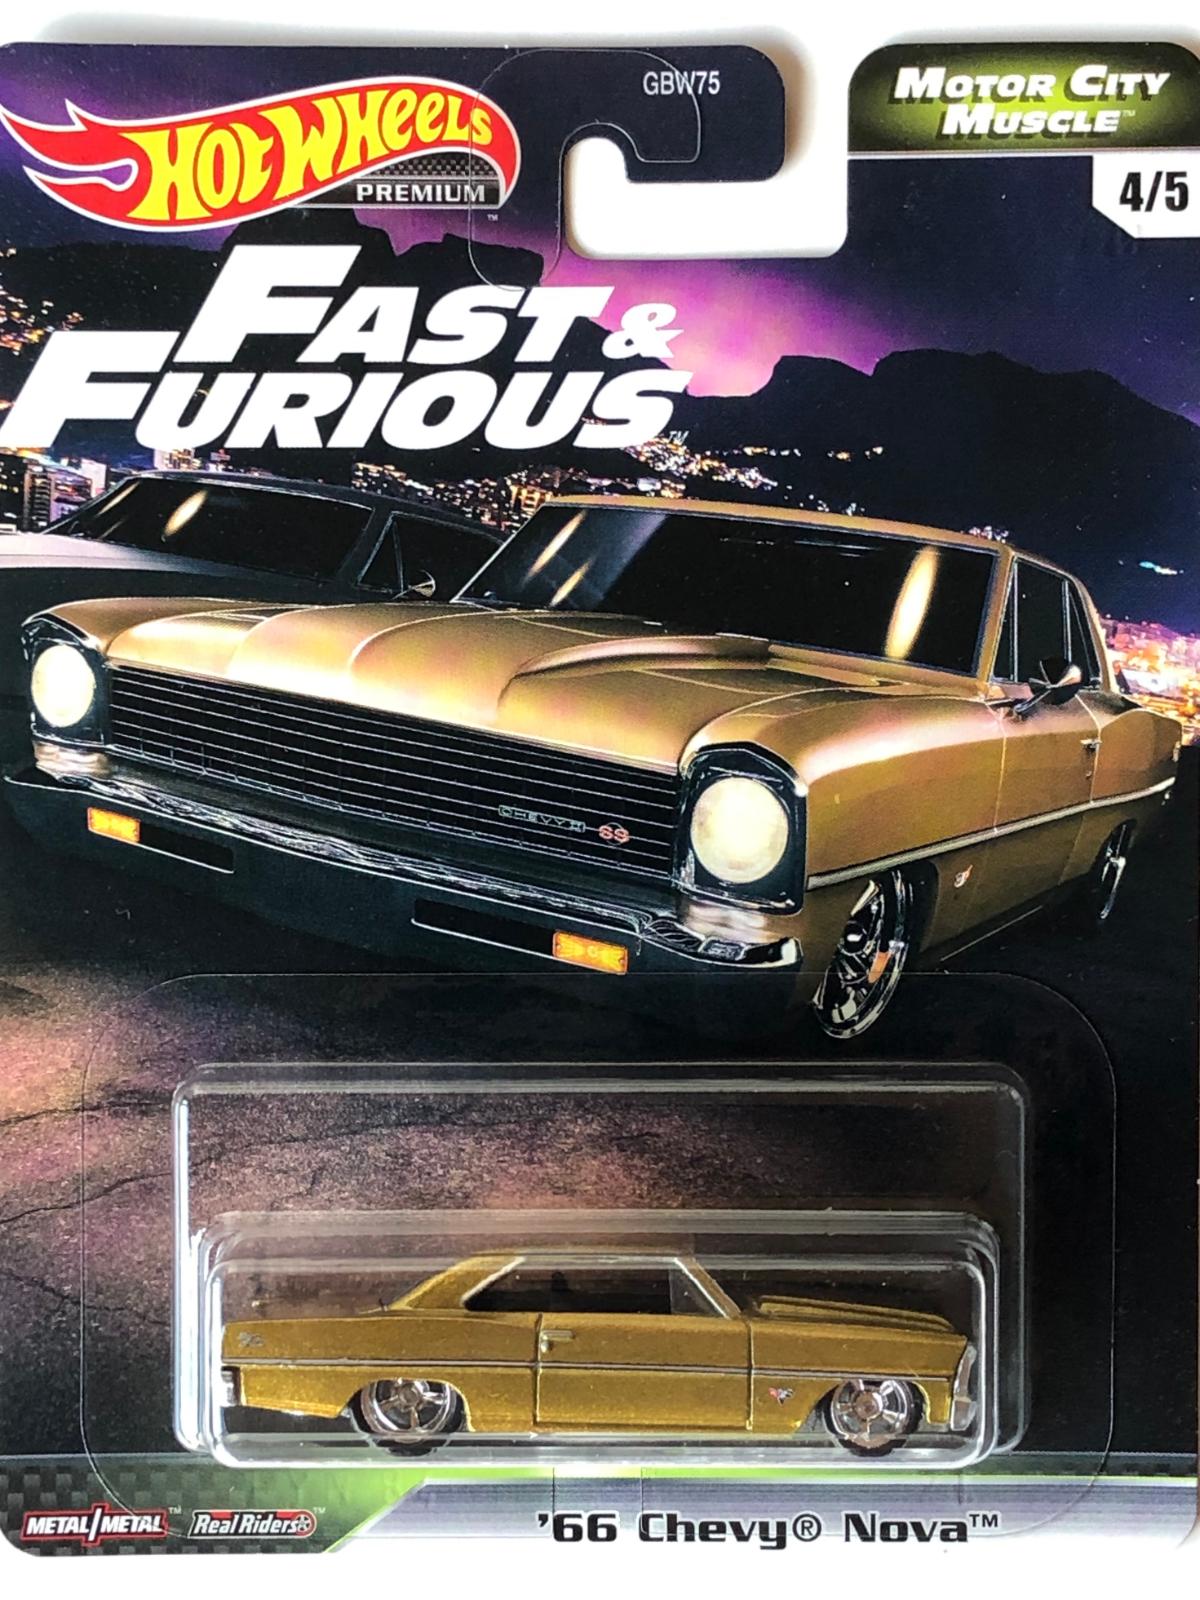 Hot Wheels - 66 Chevy Nova - Motor City Muscle - Fast and Furious - Velozes e Furiosos